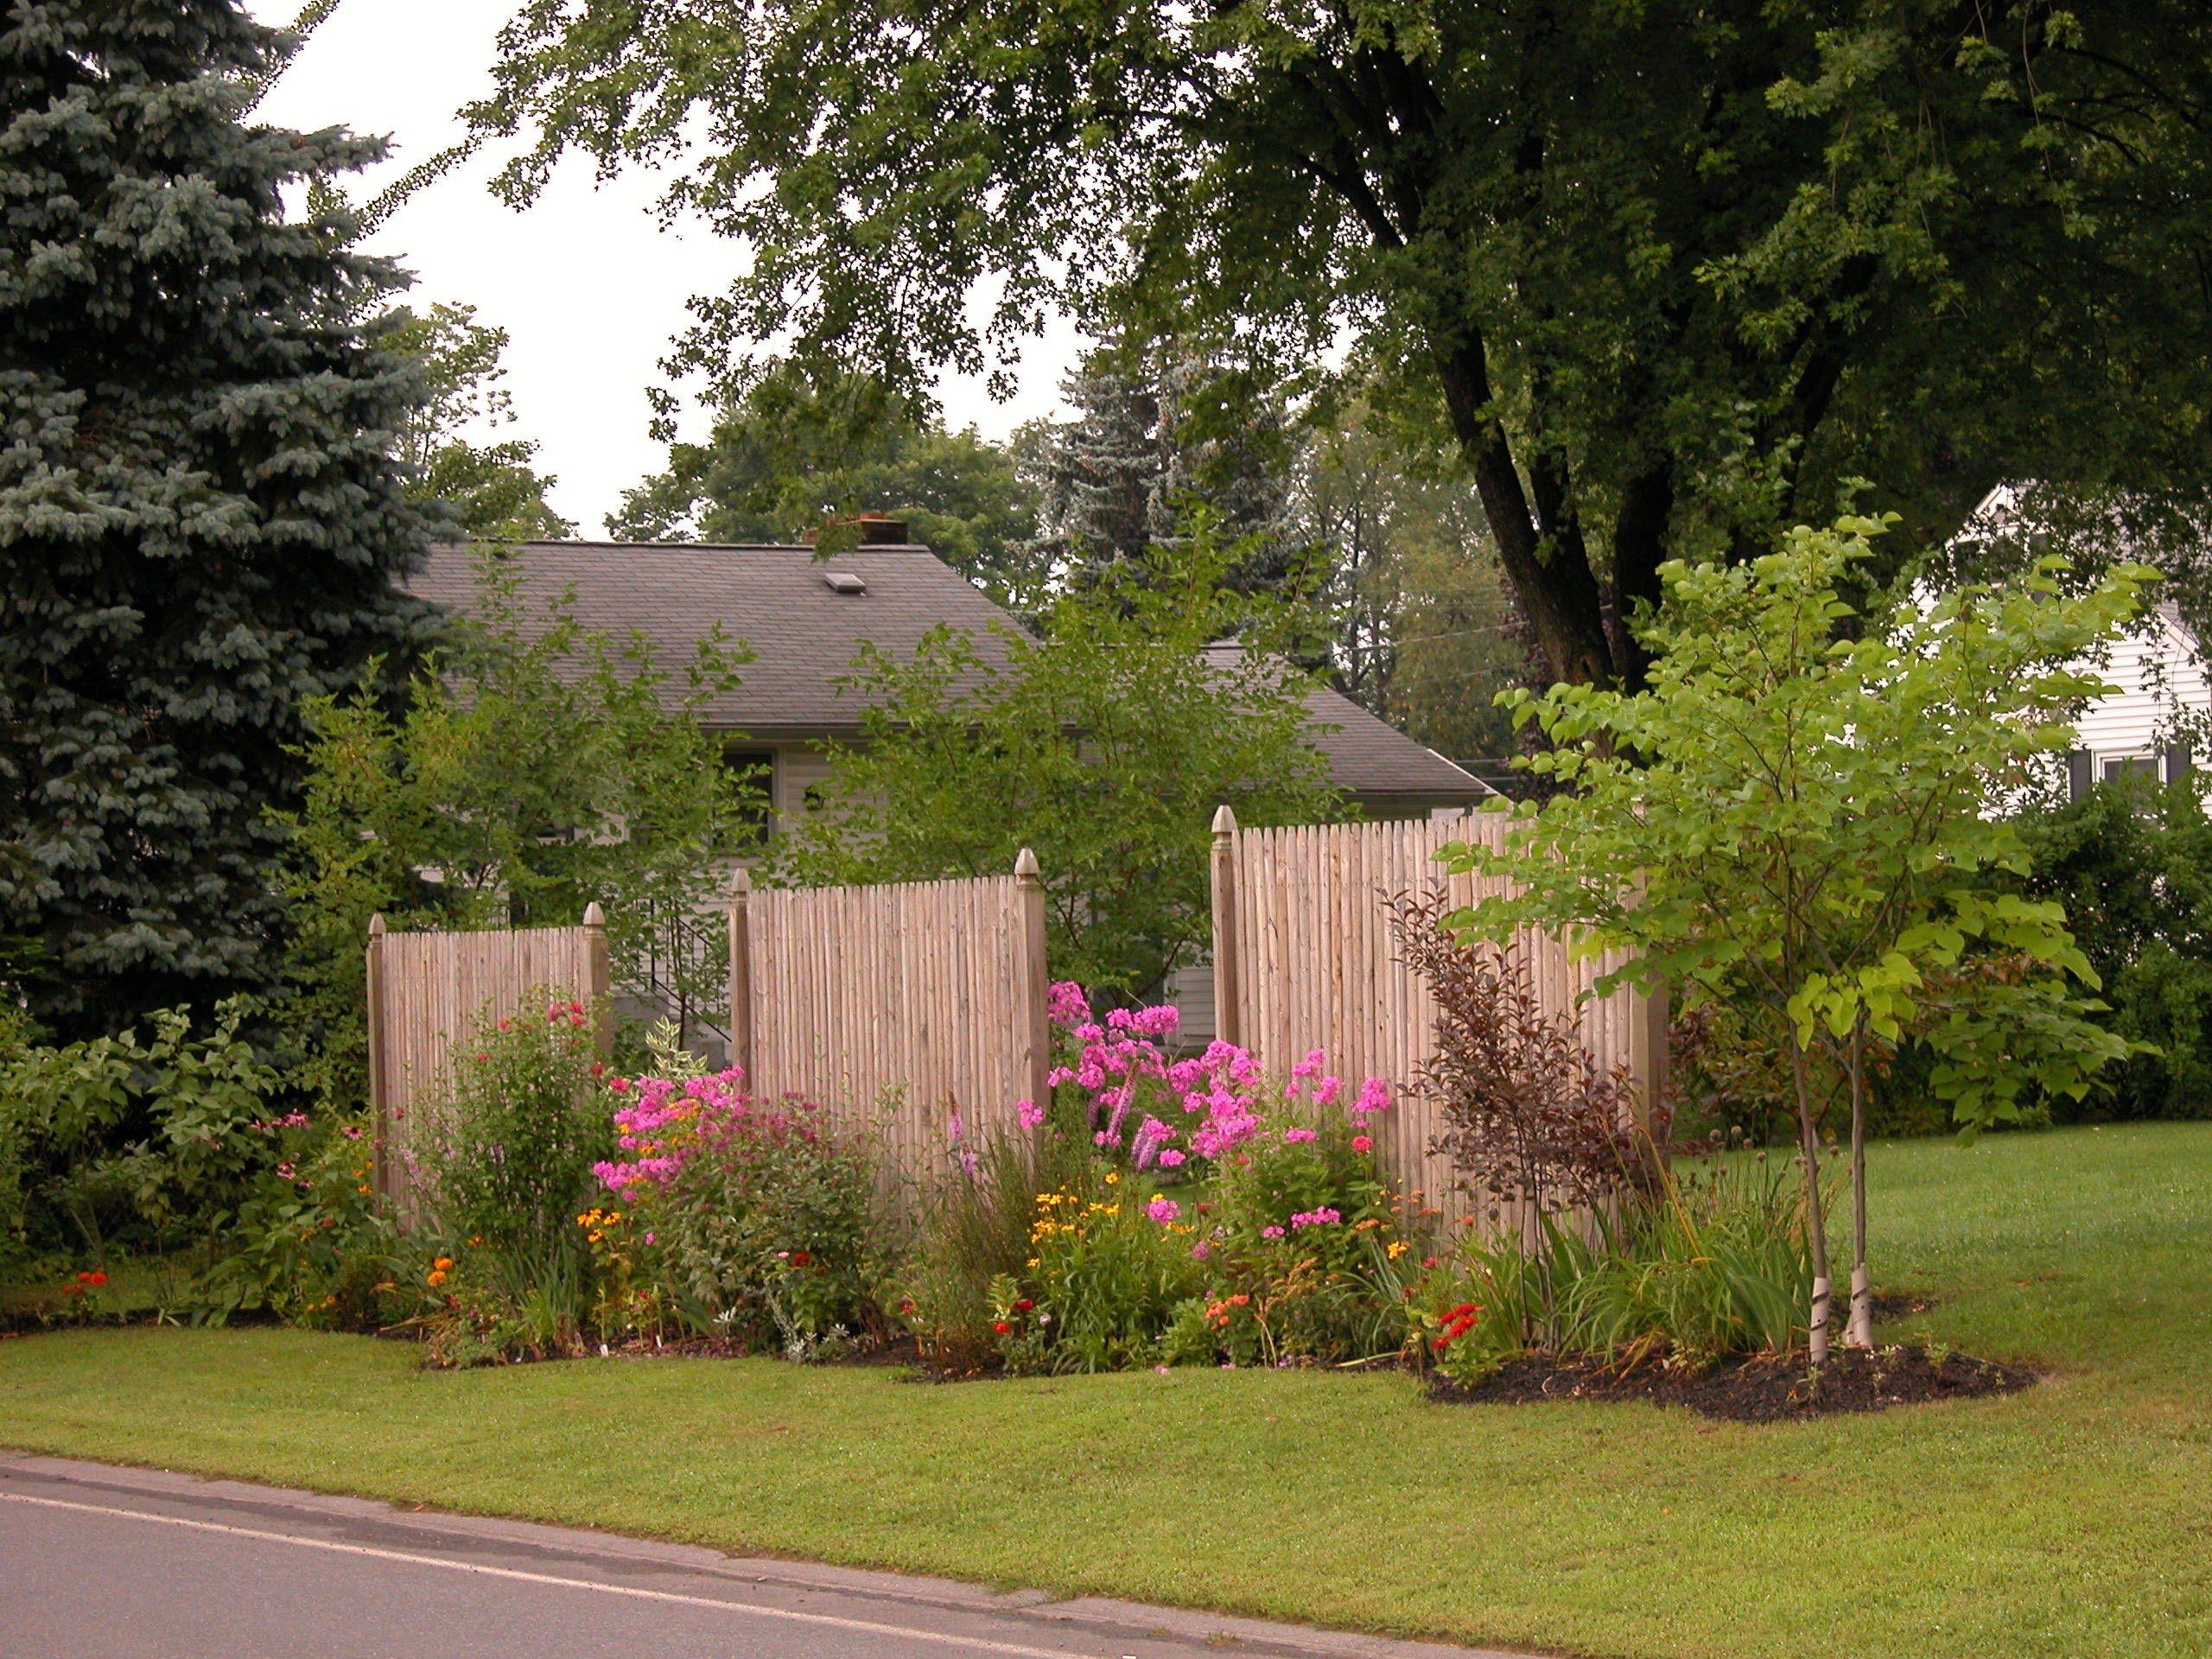 25.SIMPHOME.COM designing a small garden backyard privacy